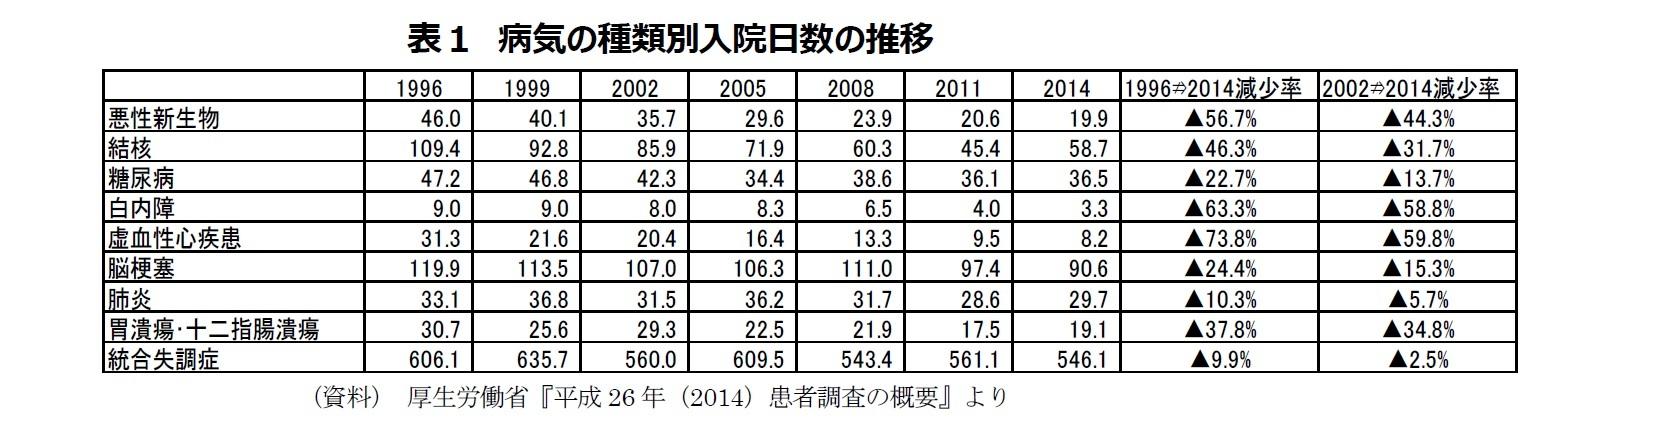 表1 病気の種類別入院日数の推移